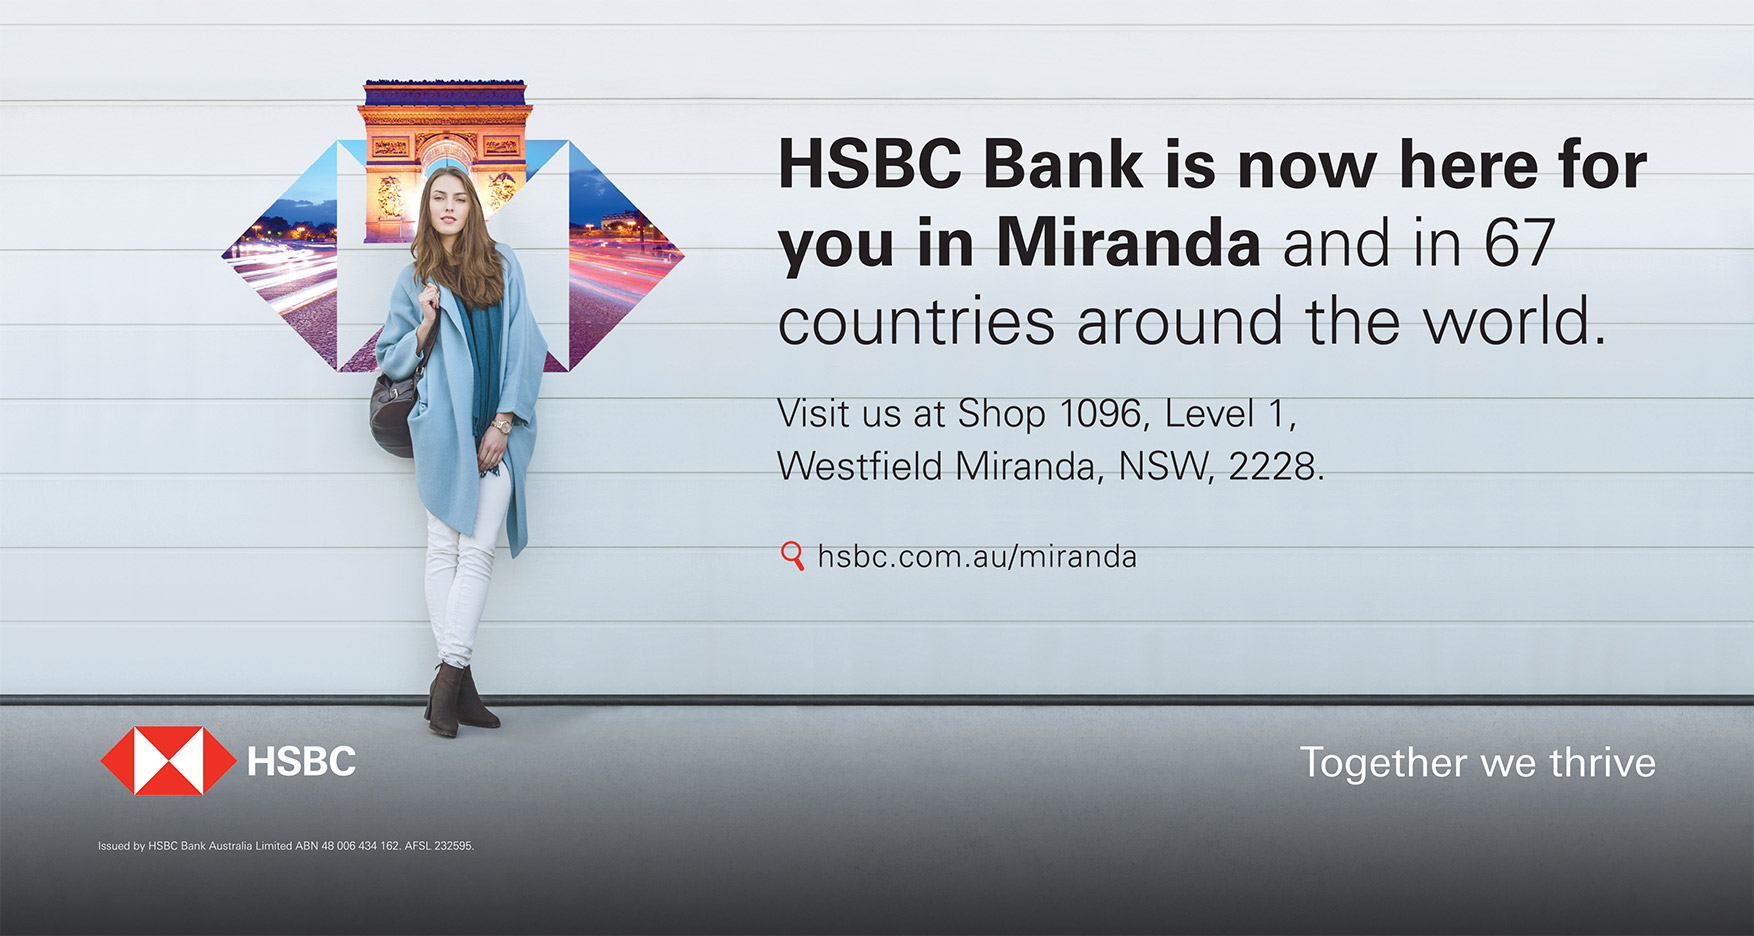 HSBC1165_CaptCook_5948x3060-PRINT.jpg